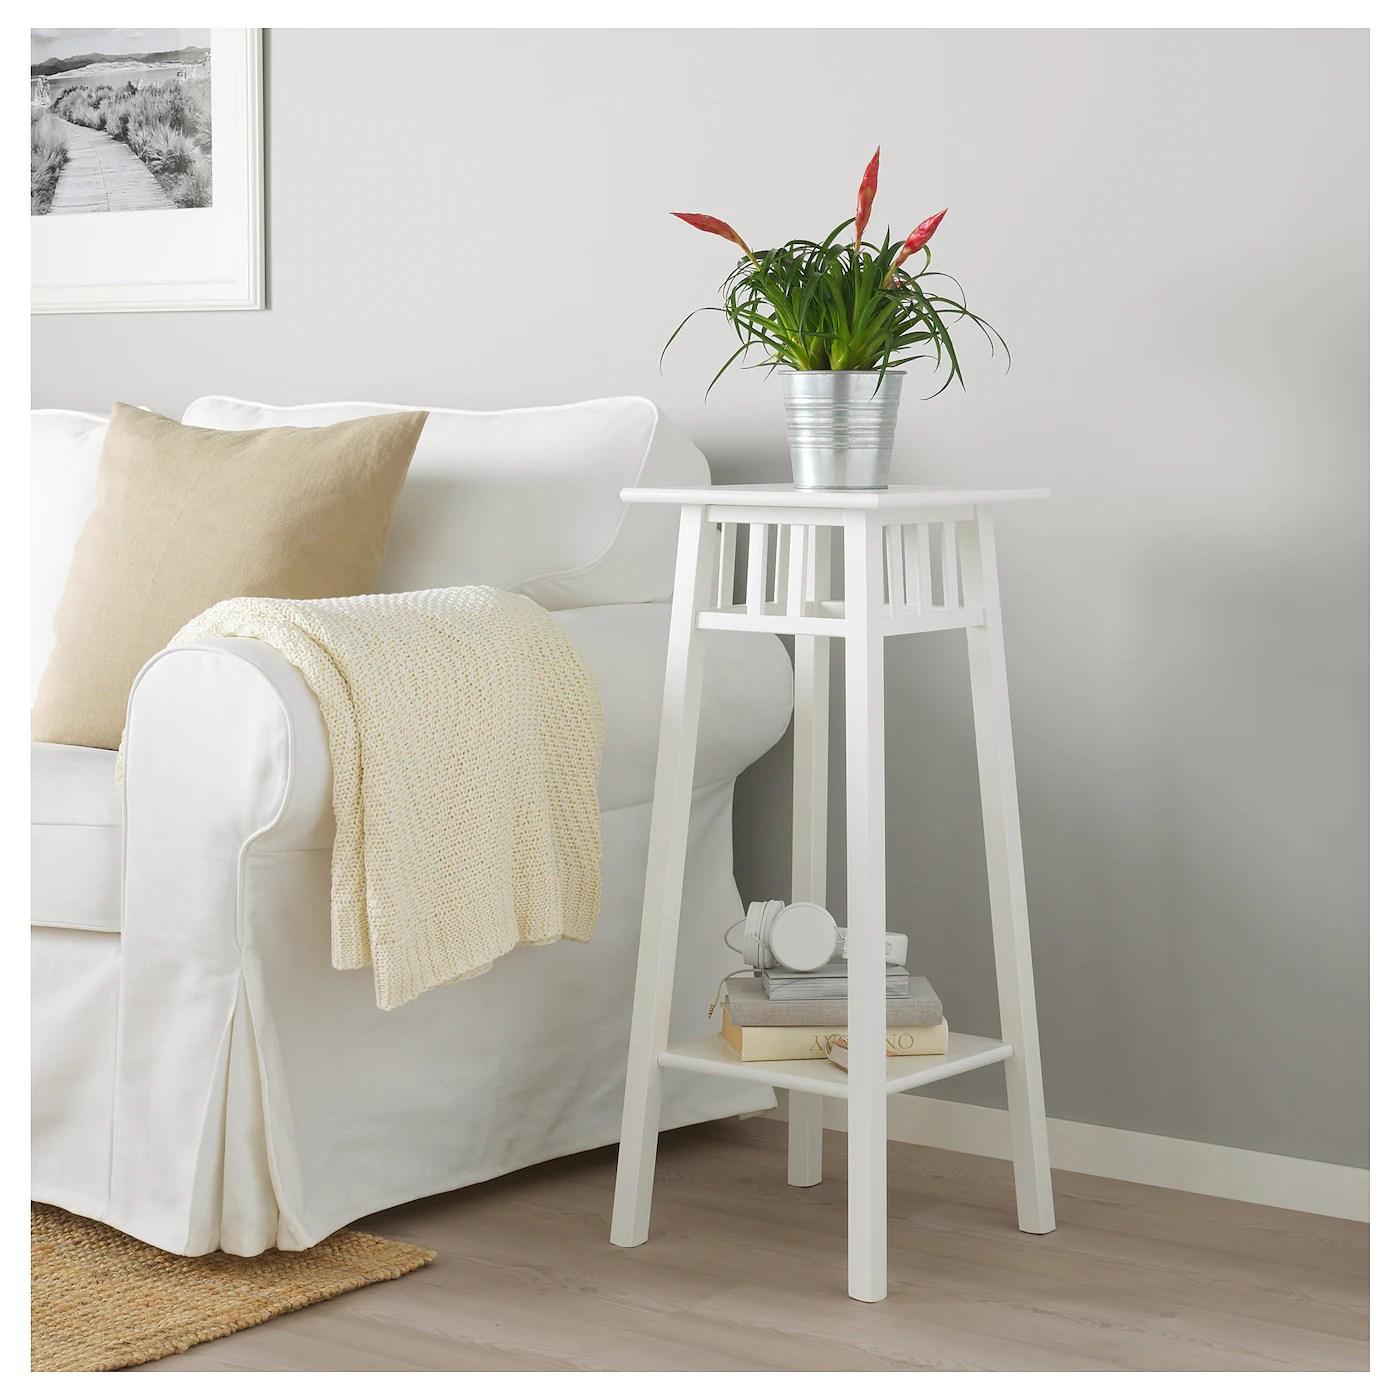 Lantliv White Plant Stand Length 32 Cm Ikea